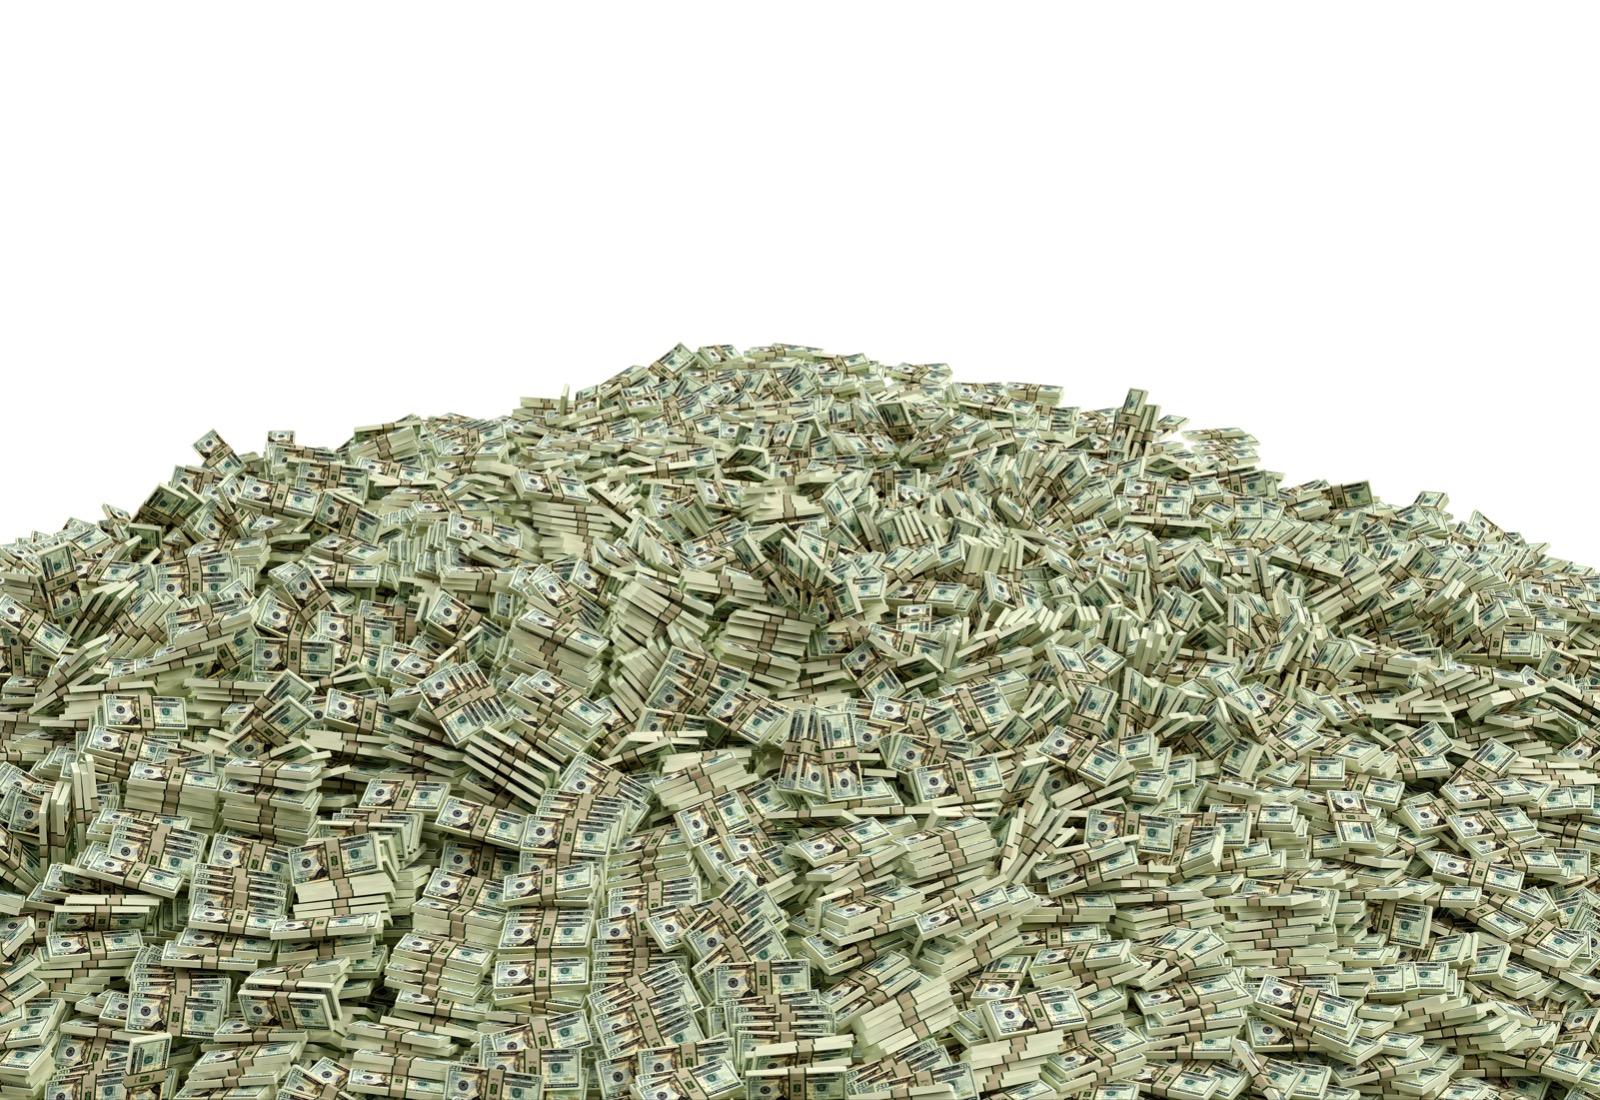 So it grows: Silver Lake raises $20bn for sixth mega-fund